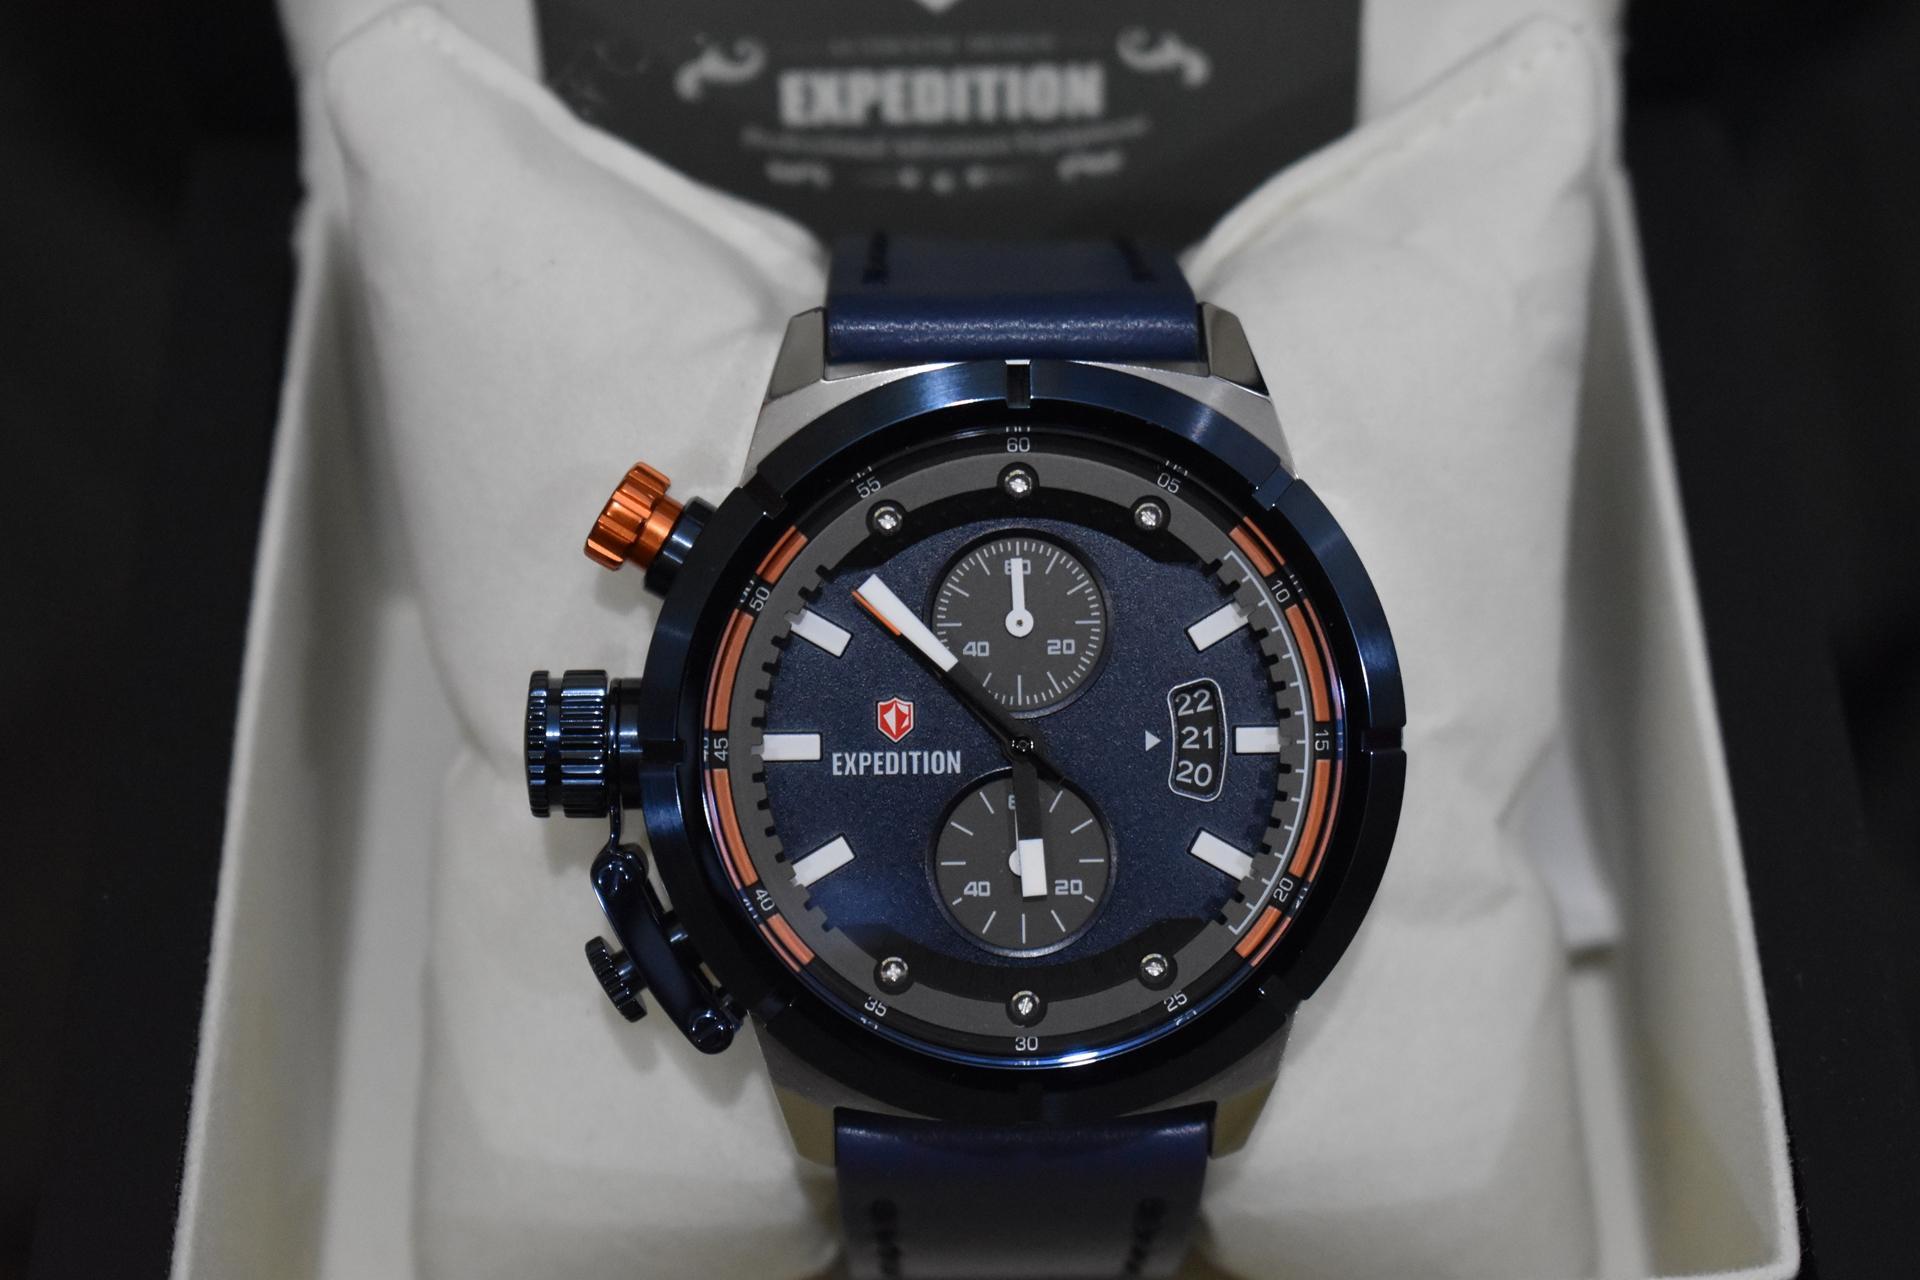 Harga Spesifikasi Jam Tangan Cowok Pria Expedition E6385 Silver E 6381silver Black 6765 Mcl E6765 Blue Leather Original